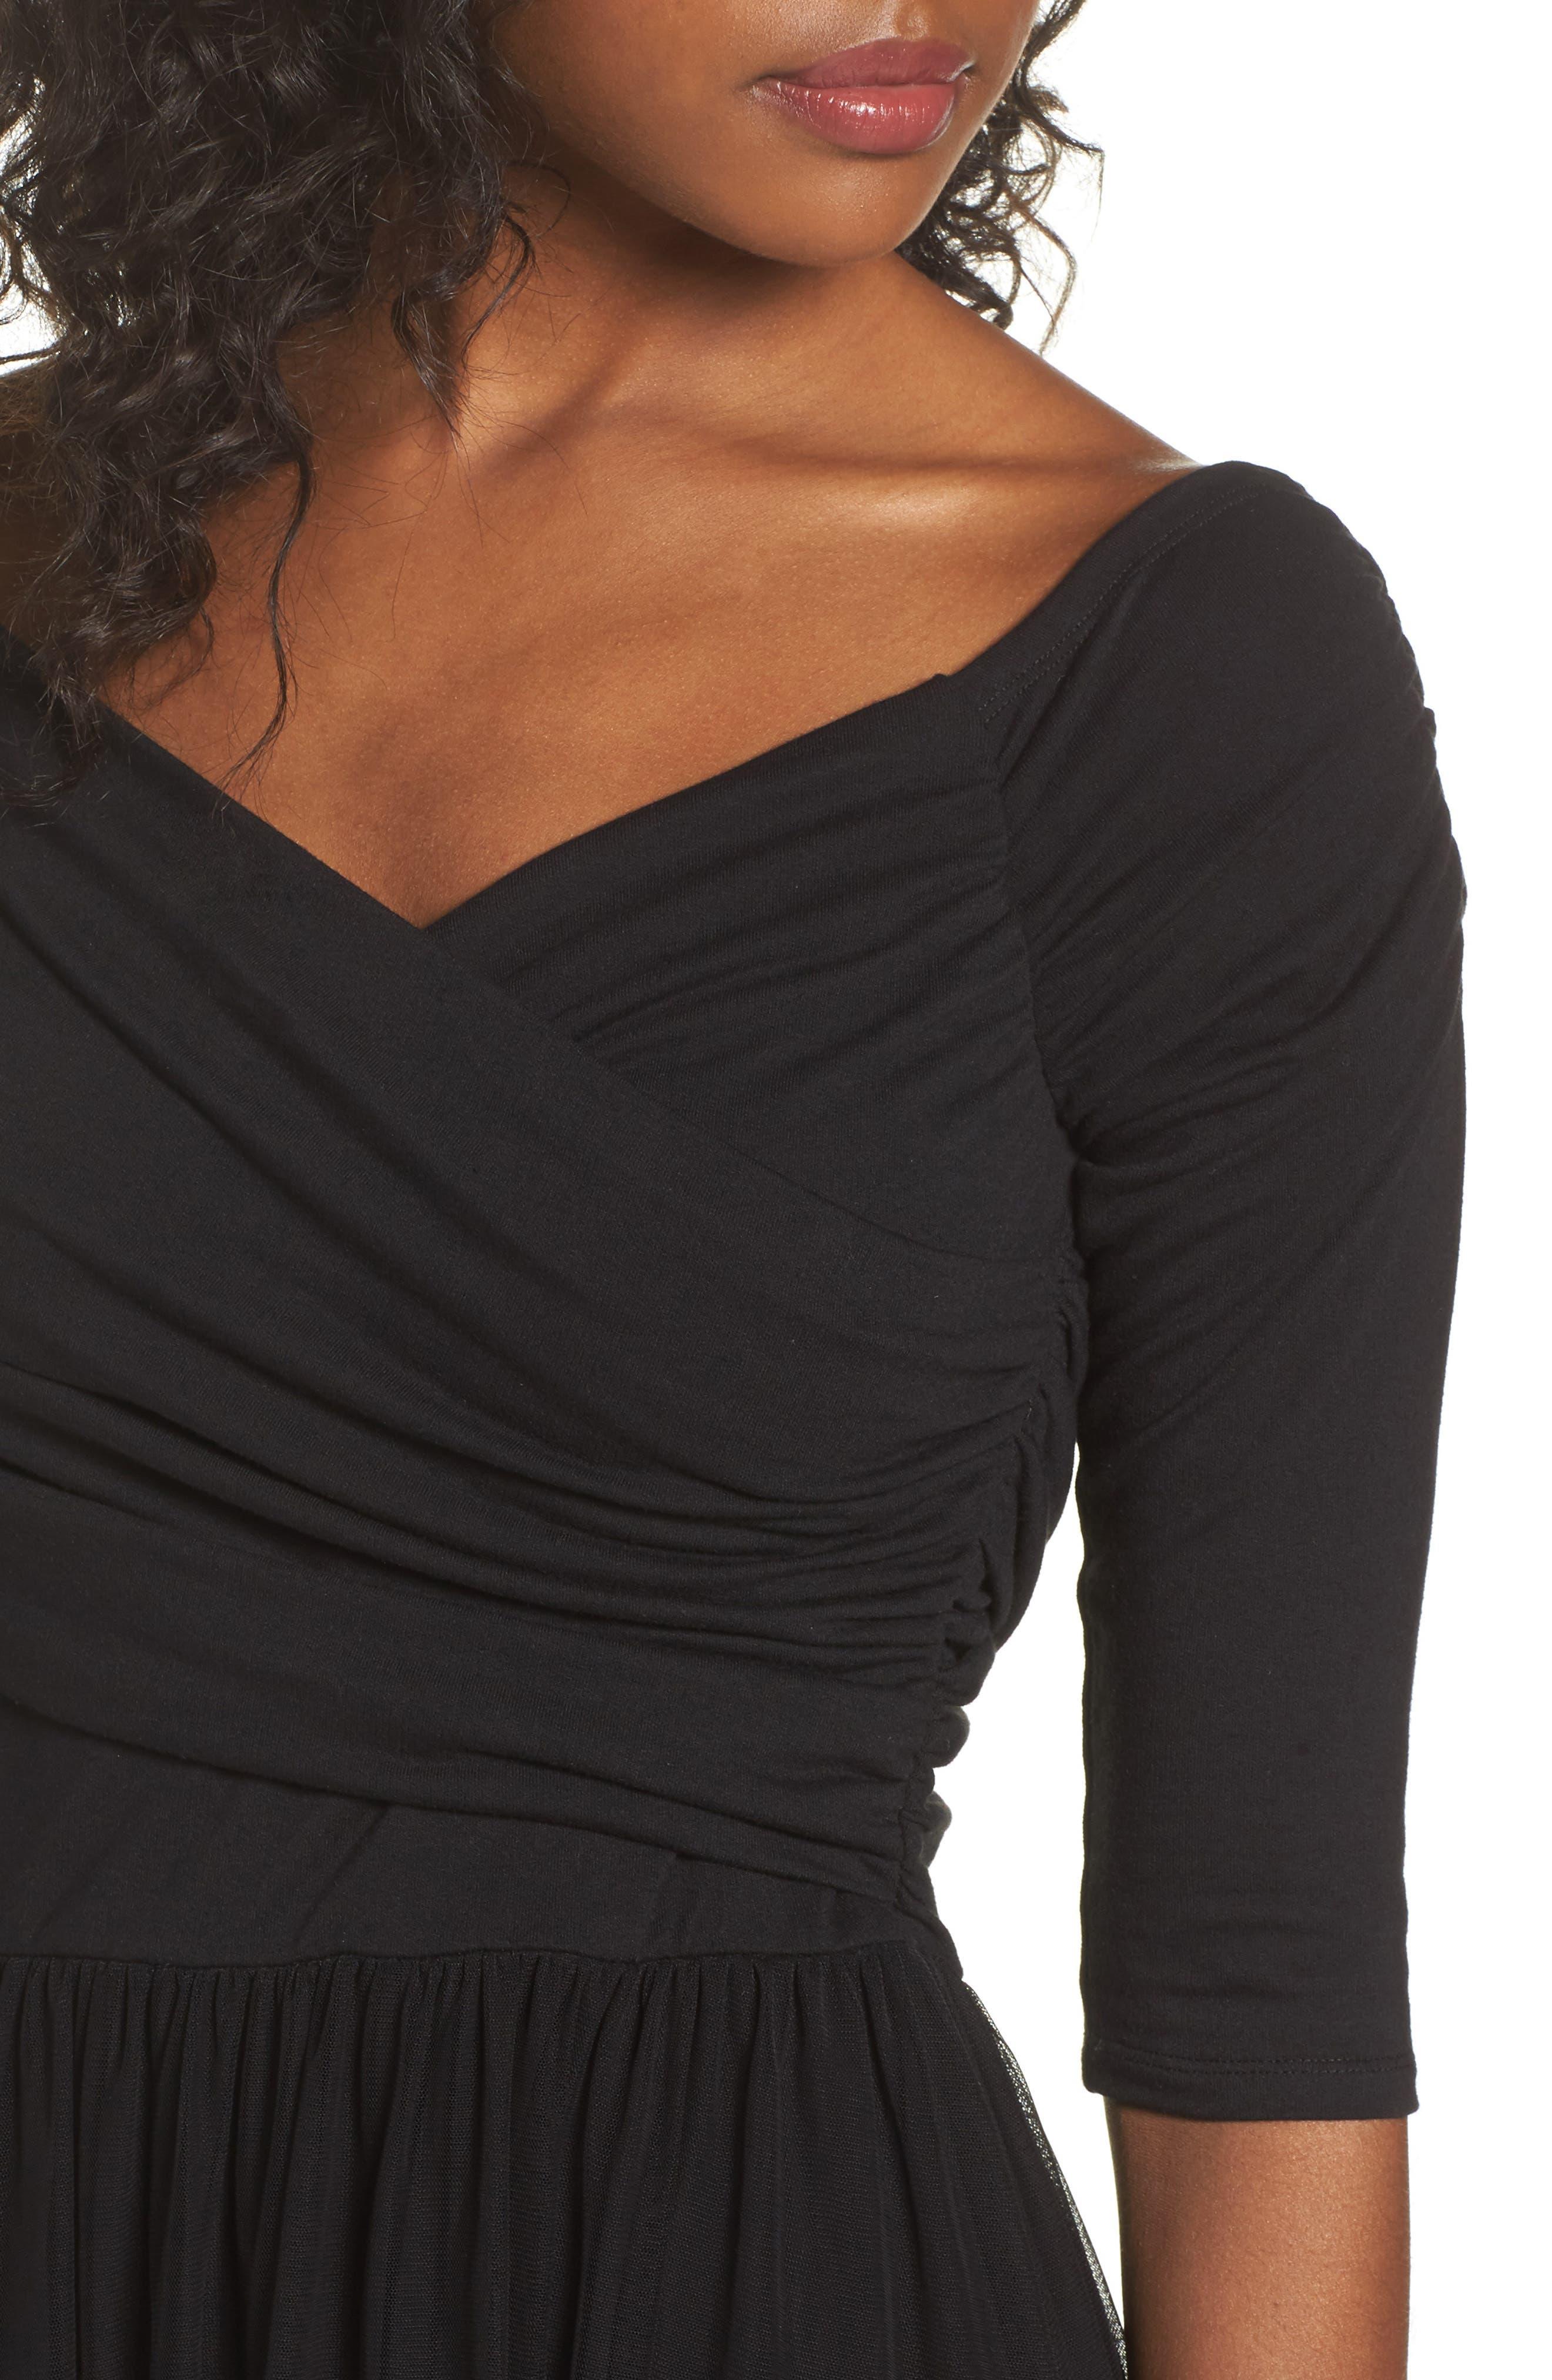 Tulle Fit & Flare Dress,                             Alternate thumbnail 4, color,                             Black